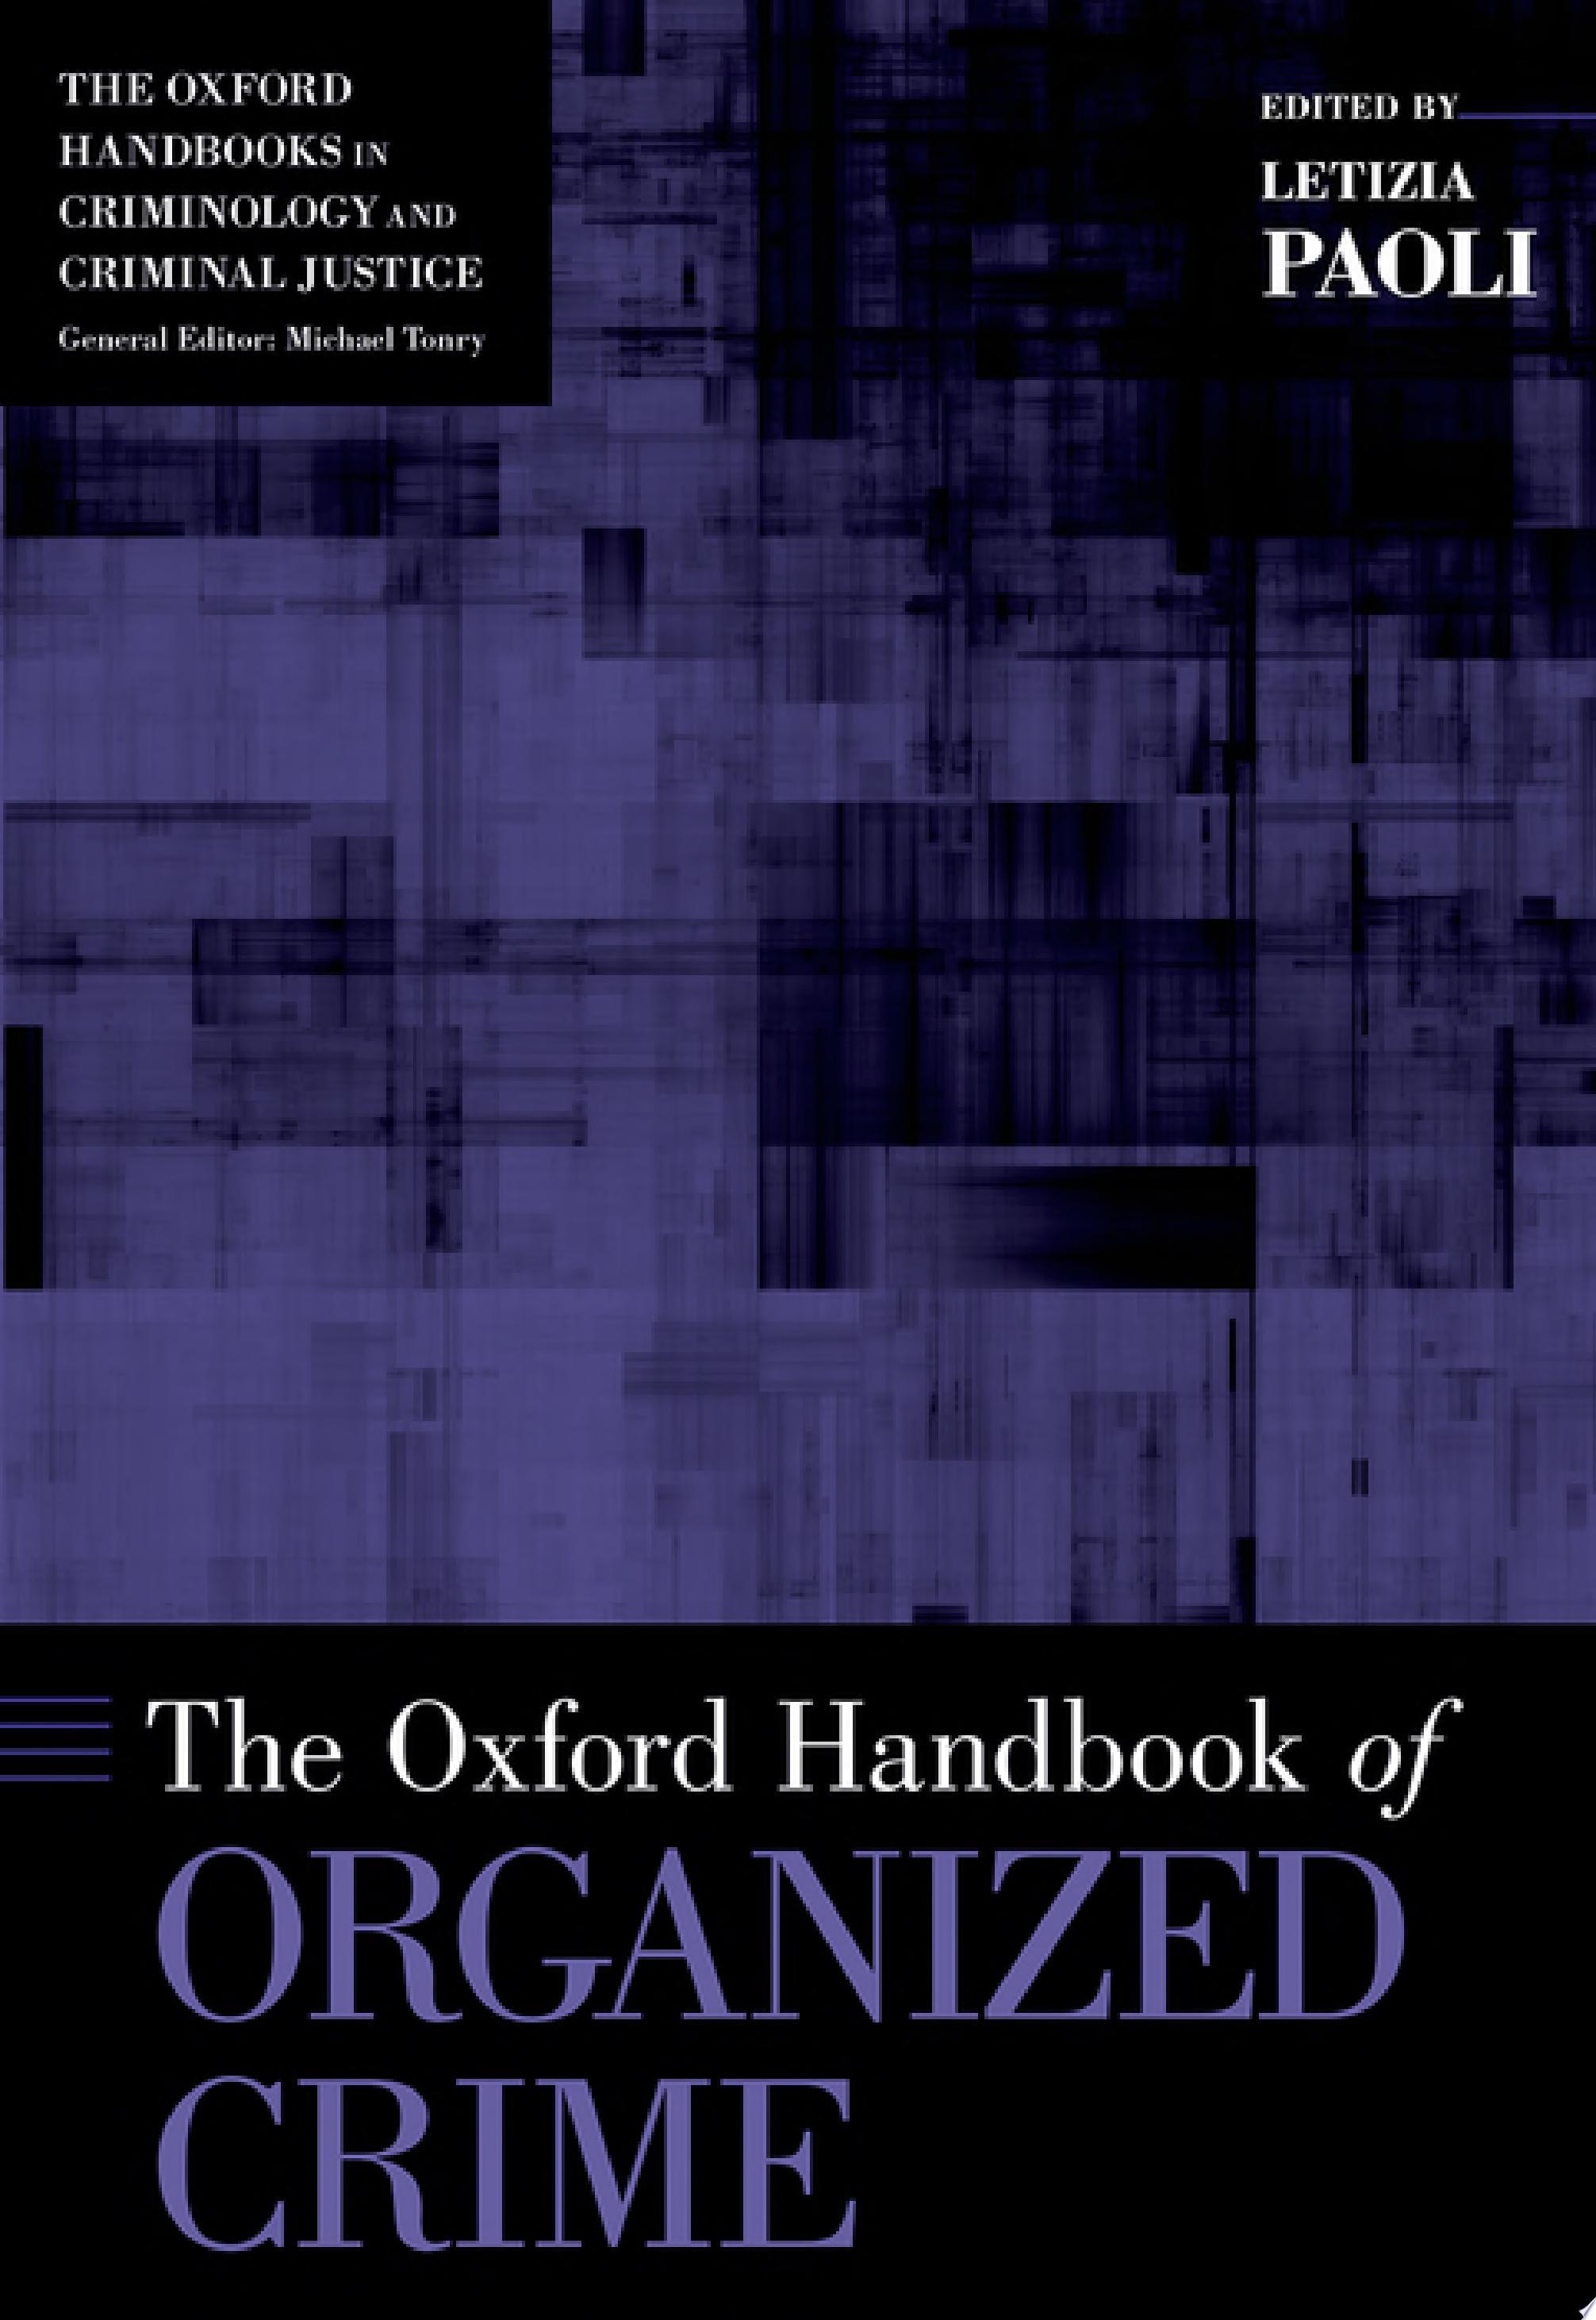 The Oxford Handbook of Organized Crime